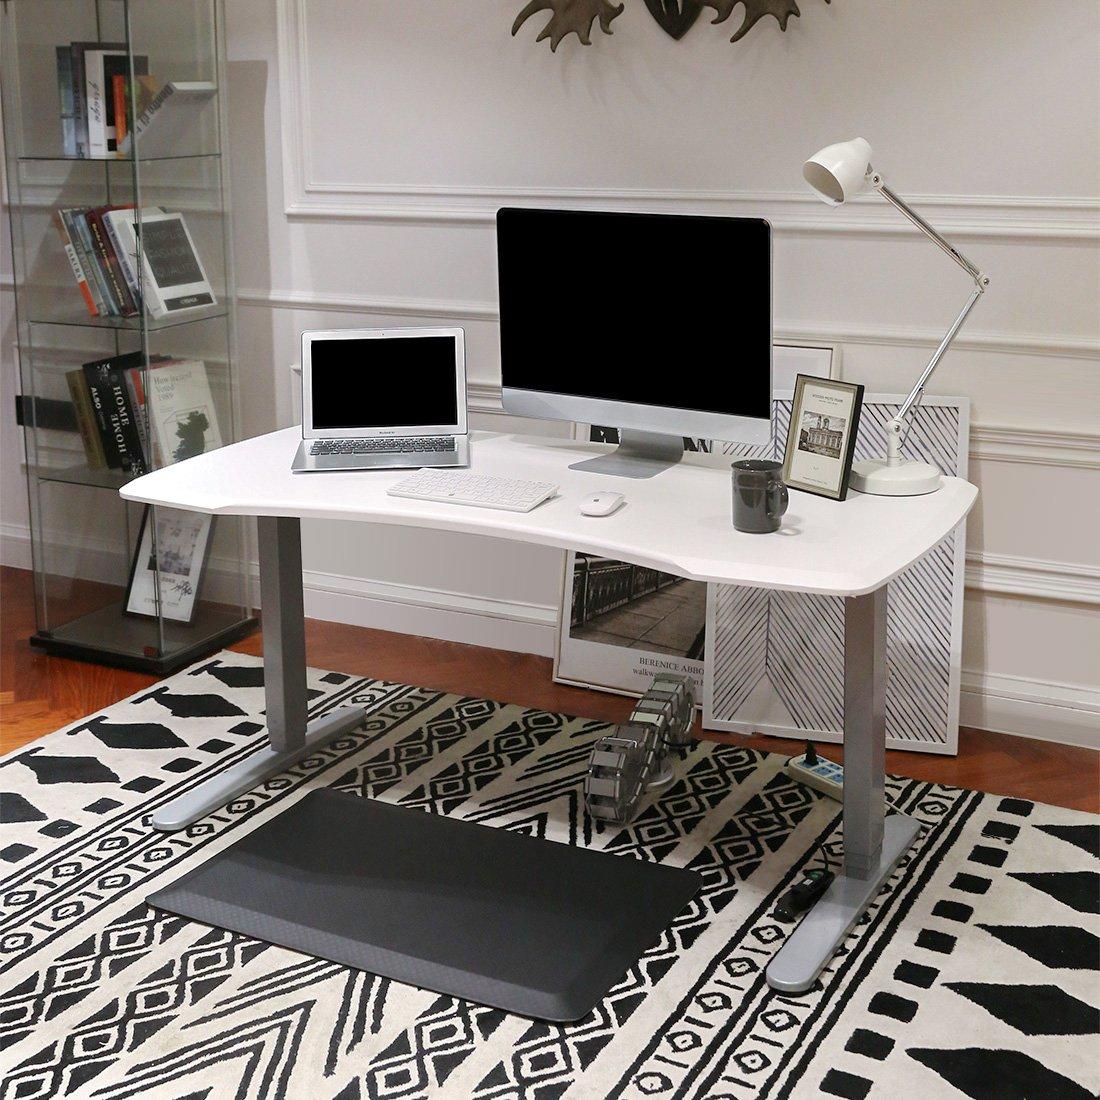 Flexispot stabile Tischplatte 2,7 cm stark - DIY Schreibtischplatte Schreibtischplatte Schreibtischplatte Bürotischplatte Spanholzplatte d75f4b